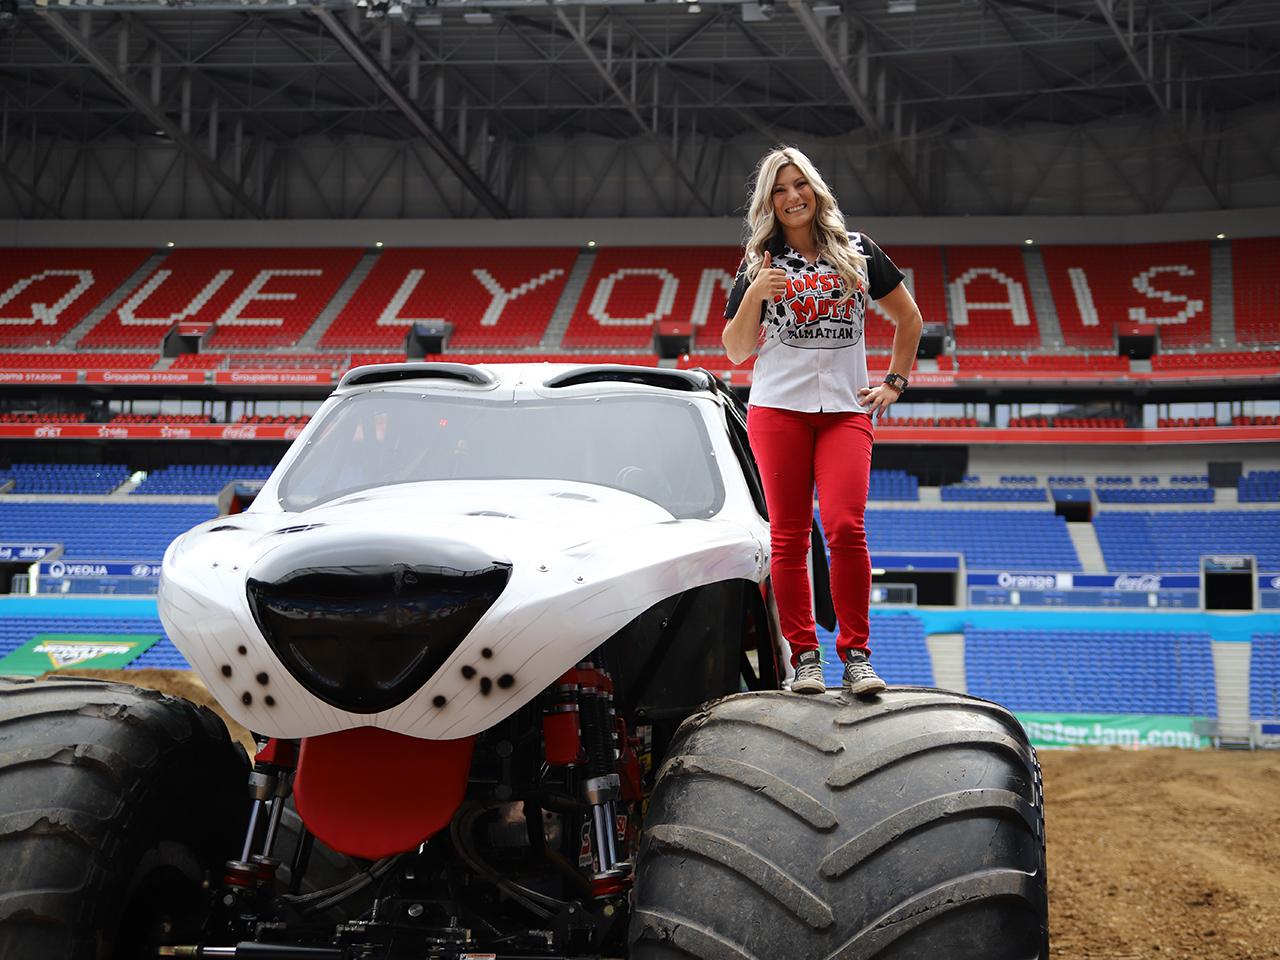 Calendrier Spectacle Monster Truck France 2022 Coronavirus : le Monster Jam au Groupama Stadium annulé